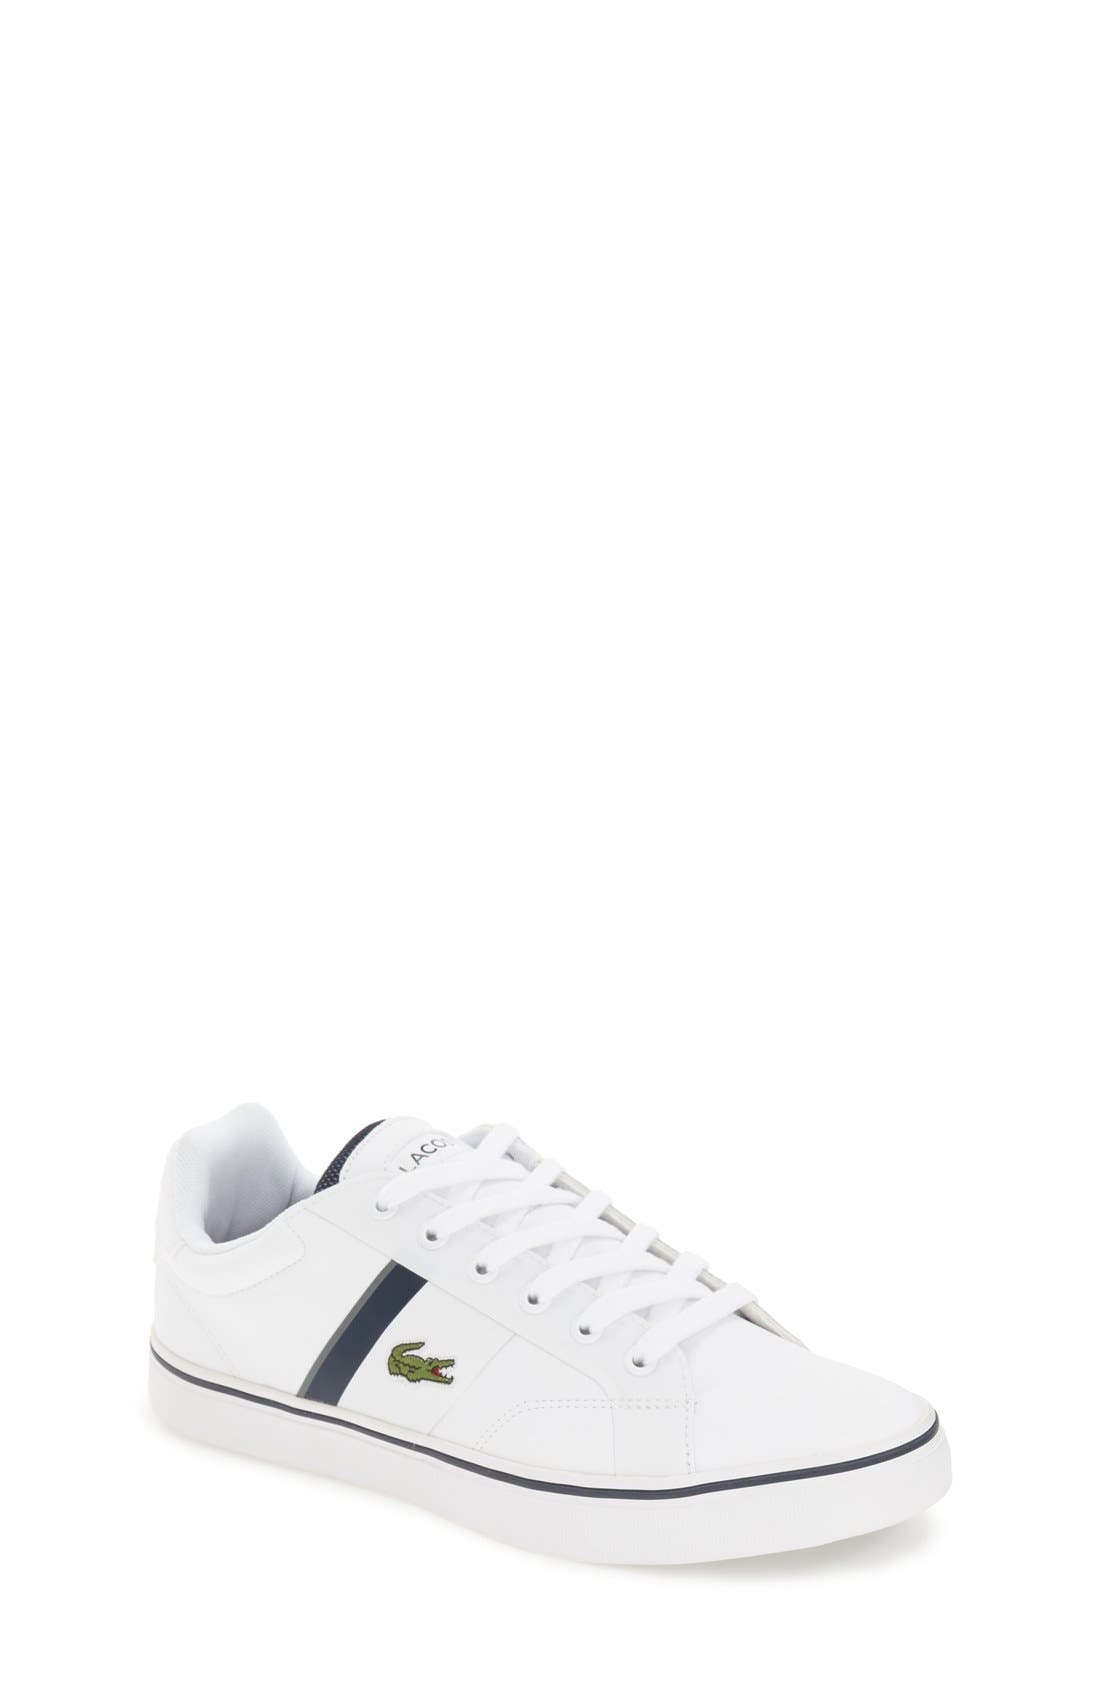 Main Image - Lacoste 'Fairland' Sneaker (Women)